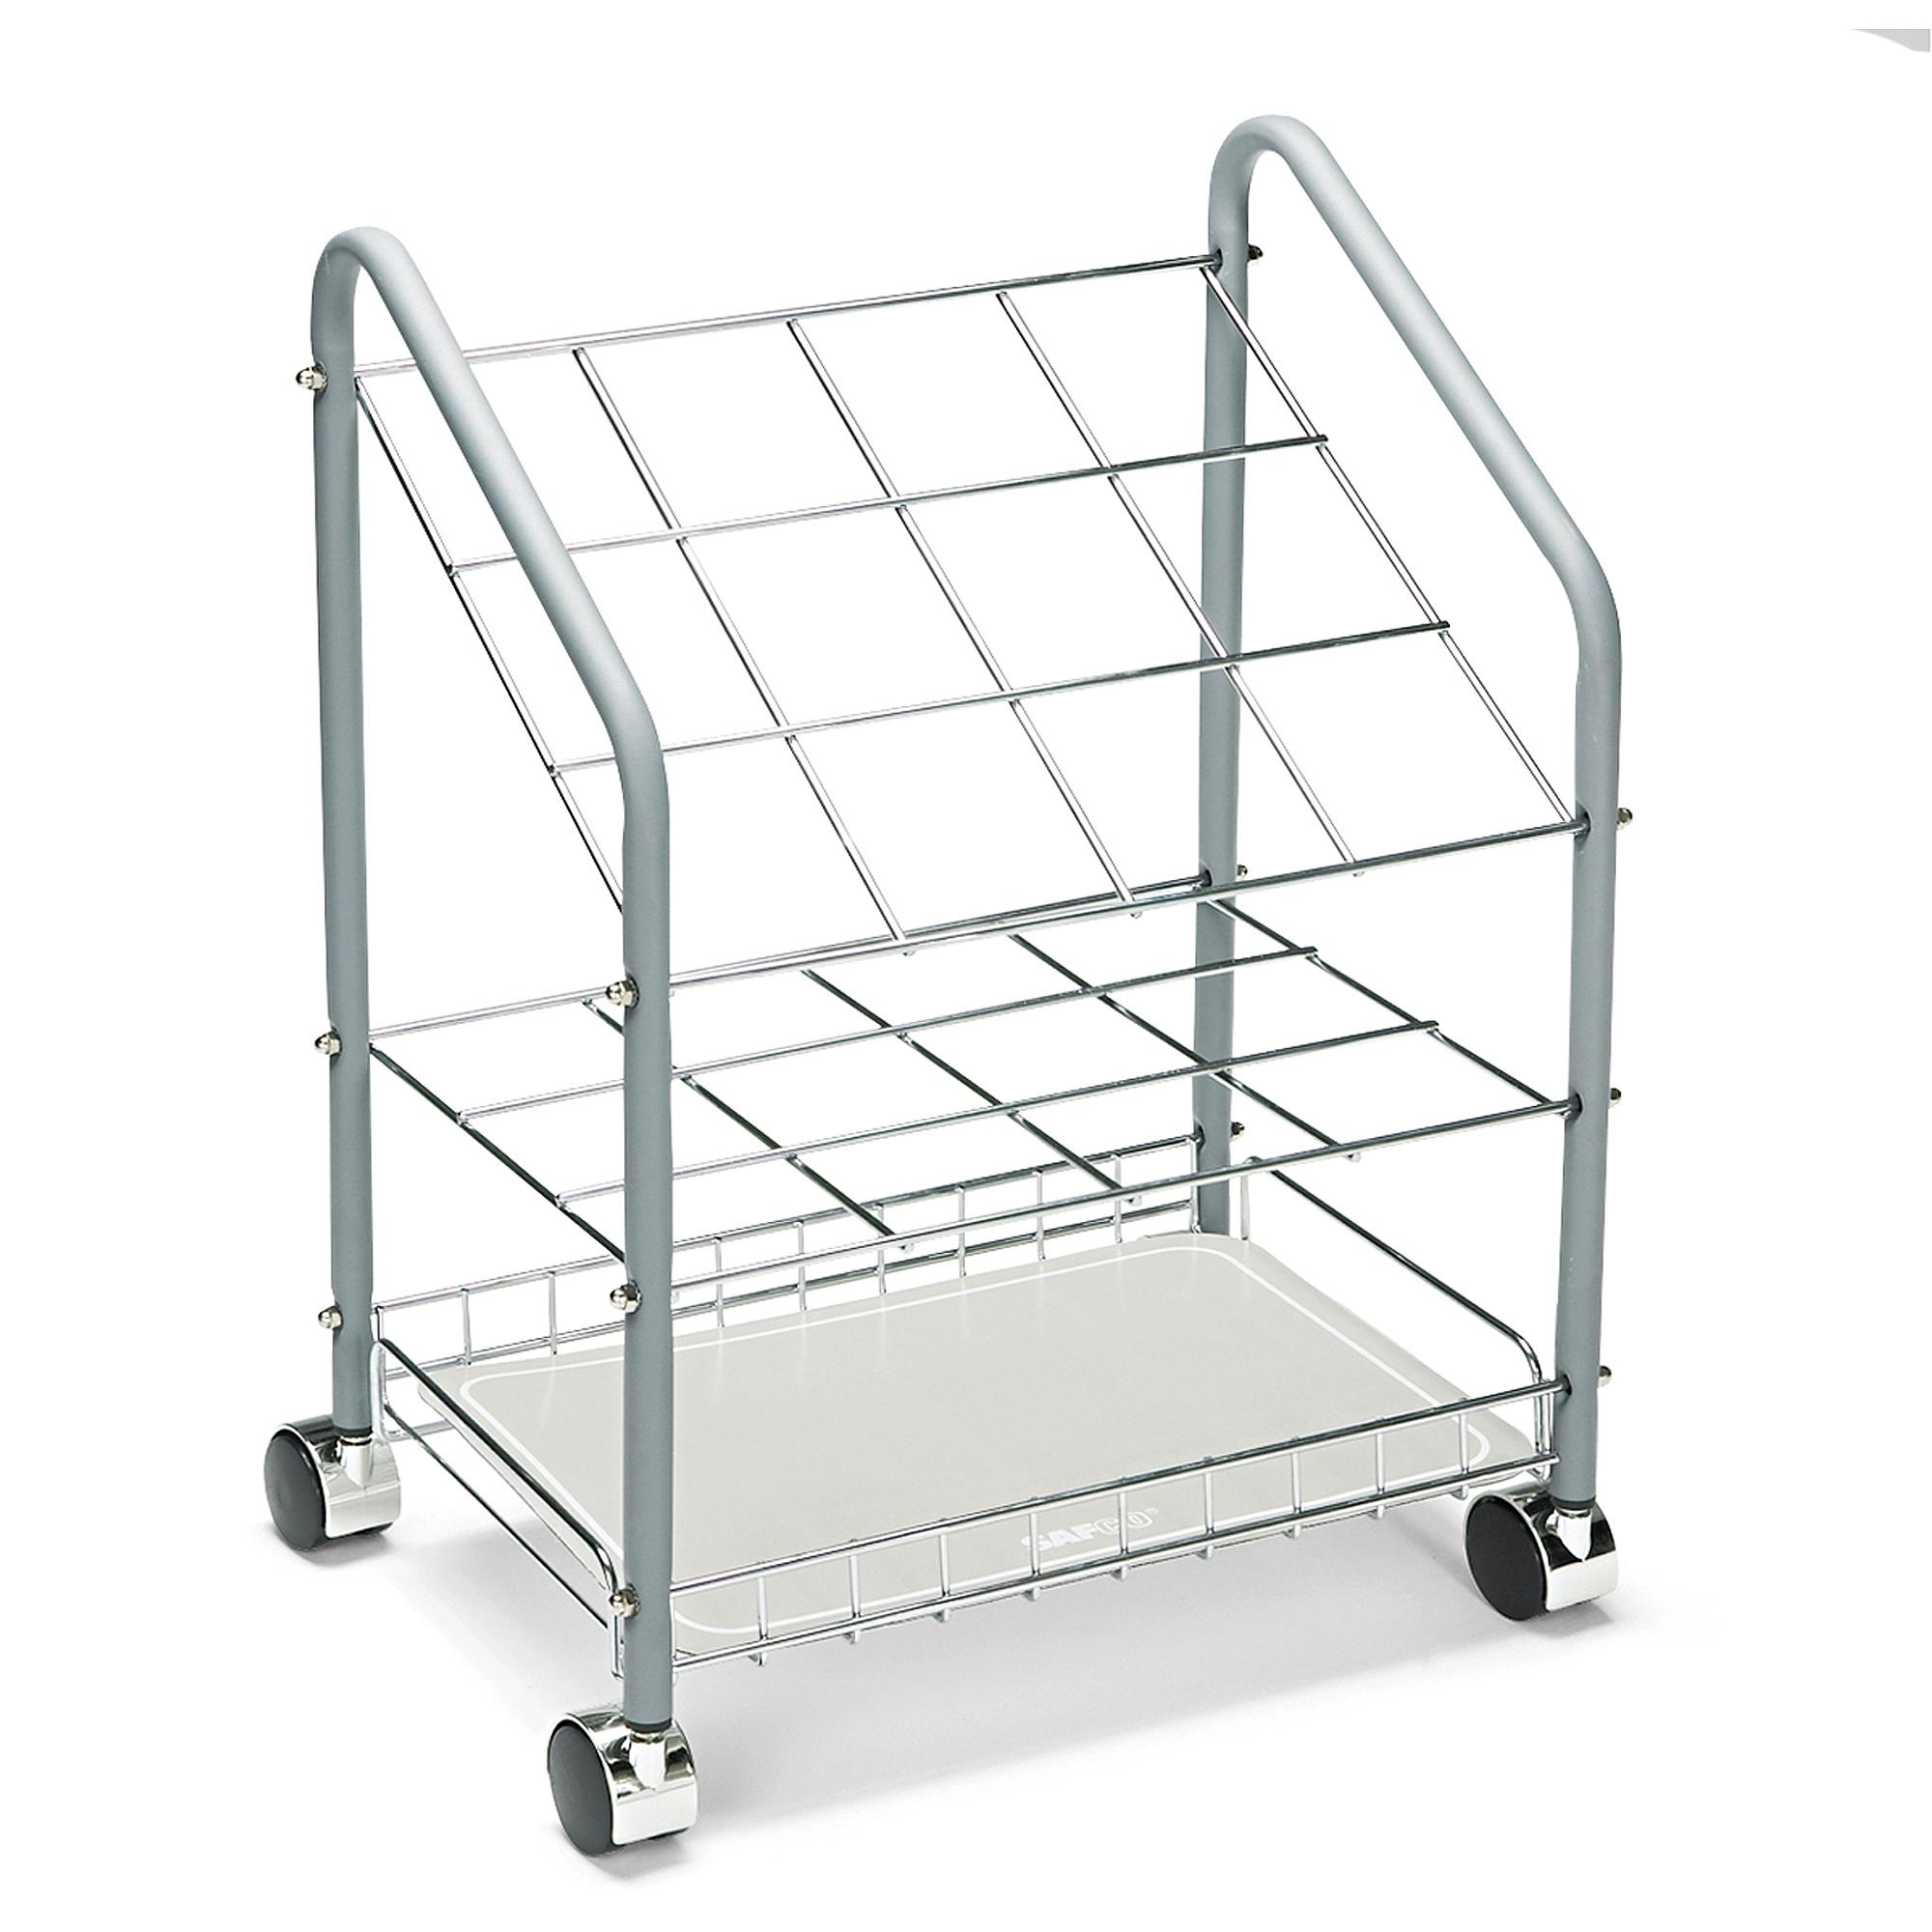 Safco Wire Roll/File, 12 Compartments, 18w x 12-3/4d x 24-1/2h, Gray